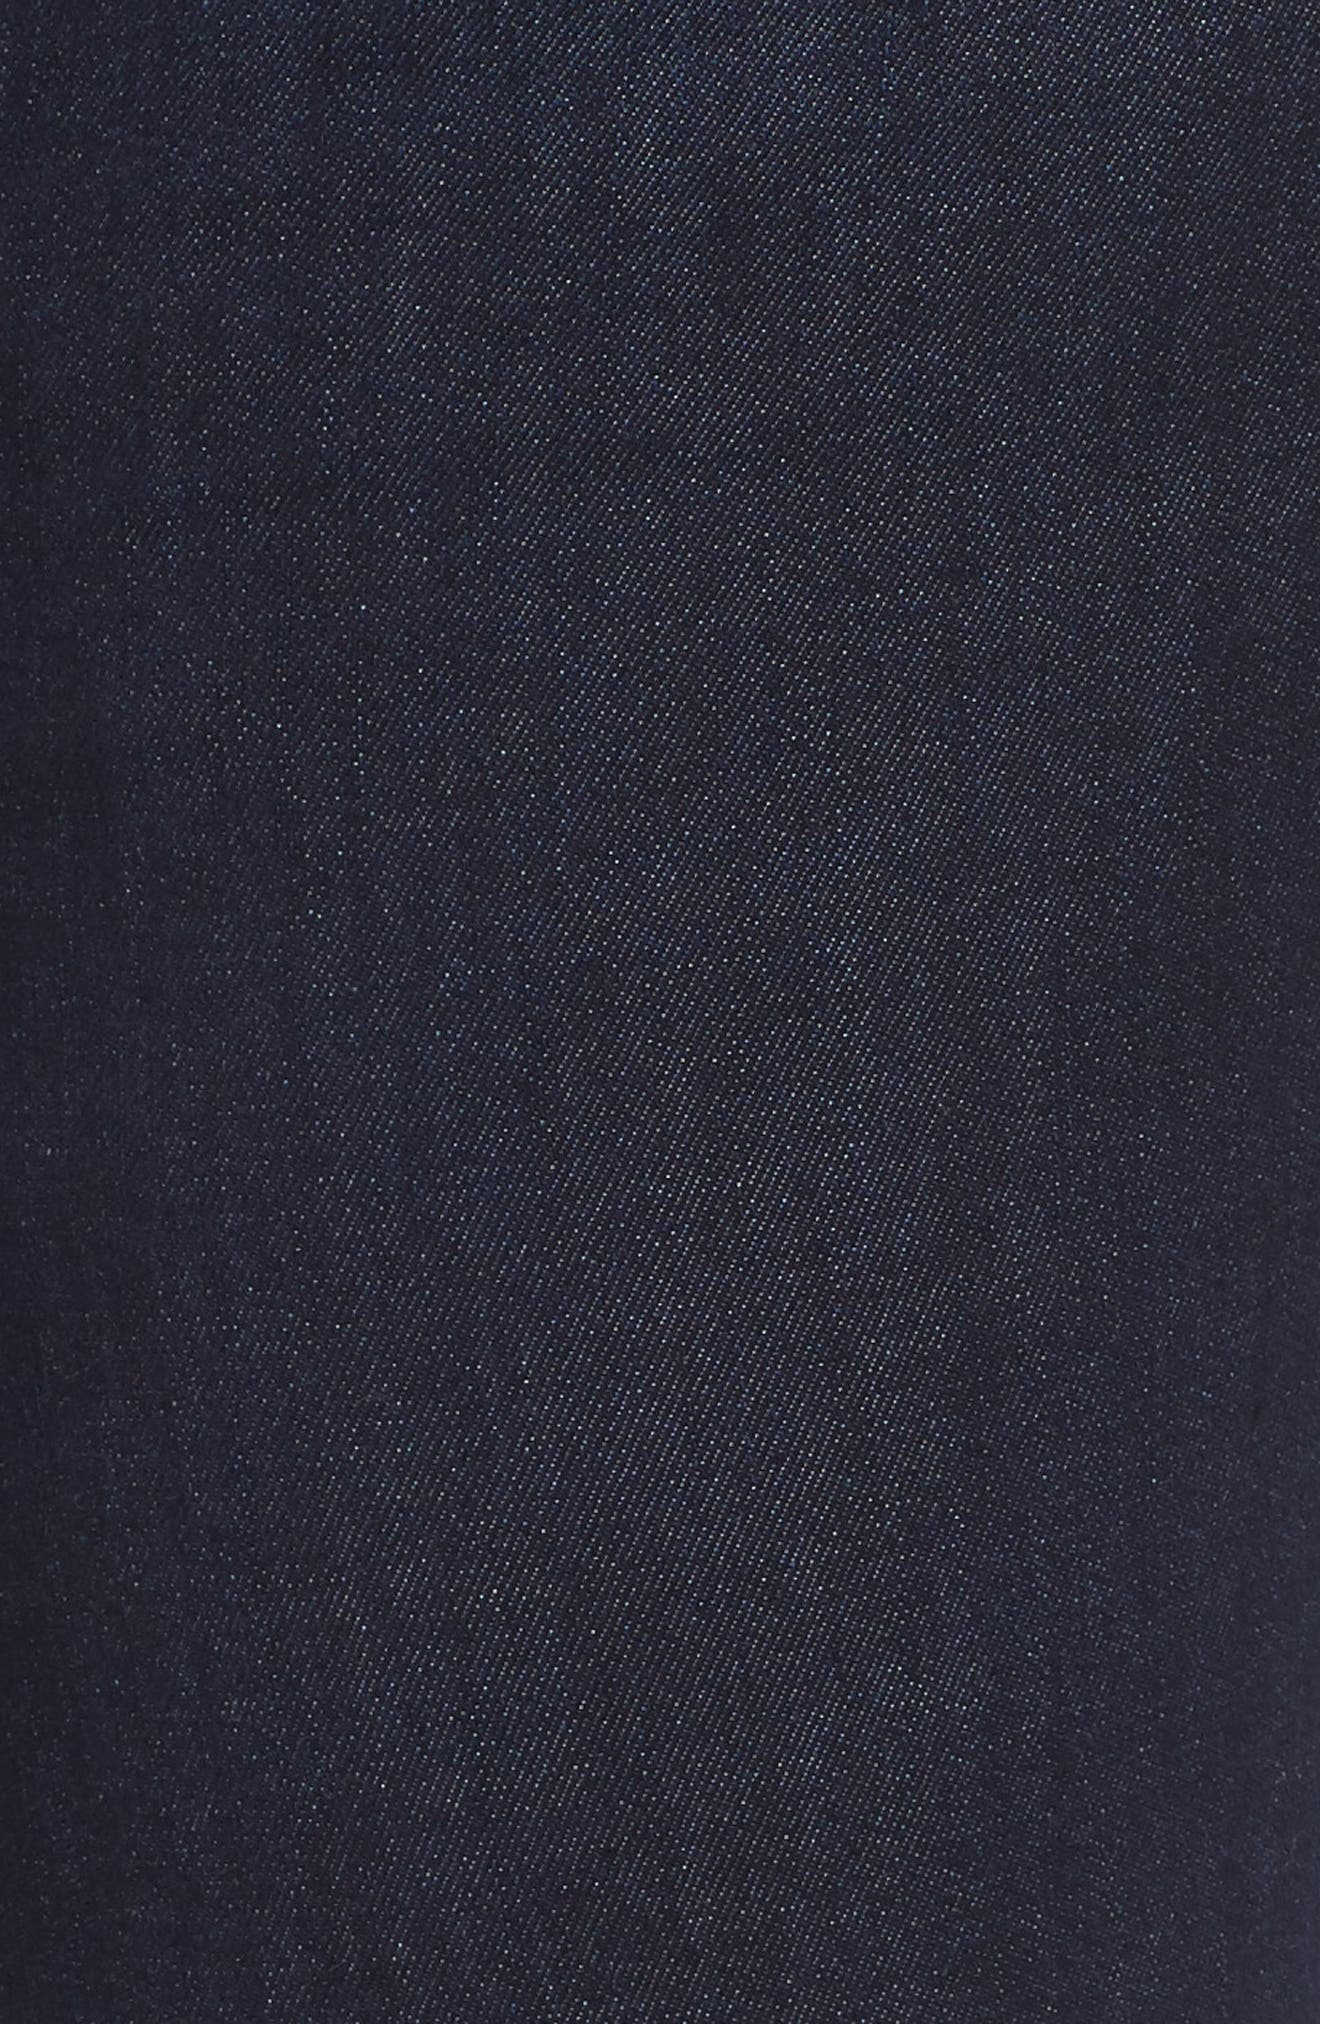 Ab-Solution Side Trim Ankle Jeans,                             Alternate thumbnail 6, color,                             INDIGO